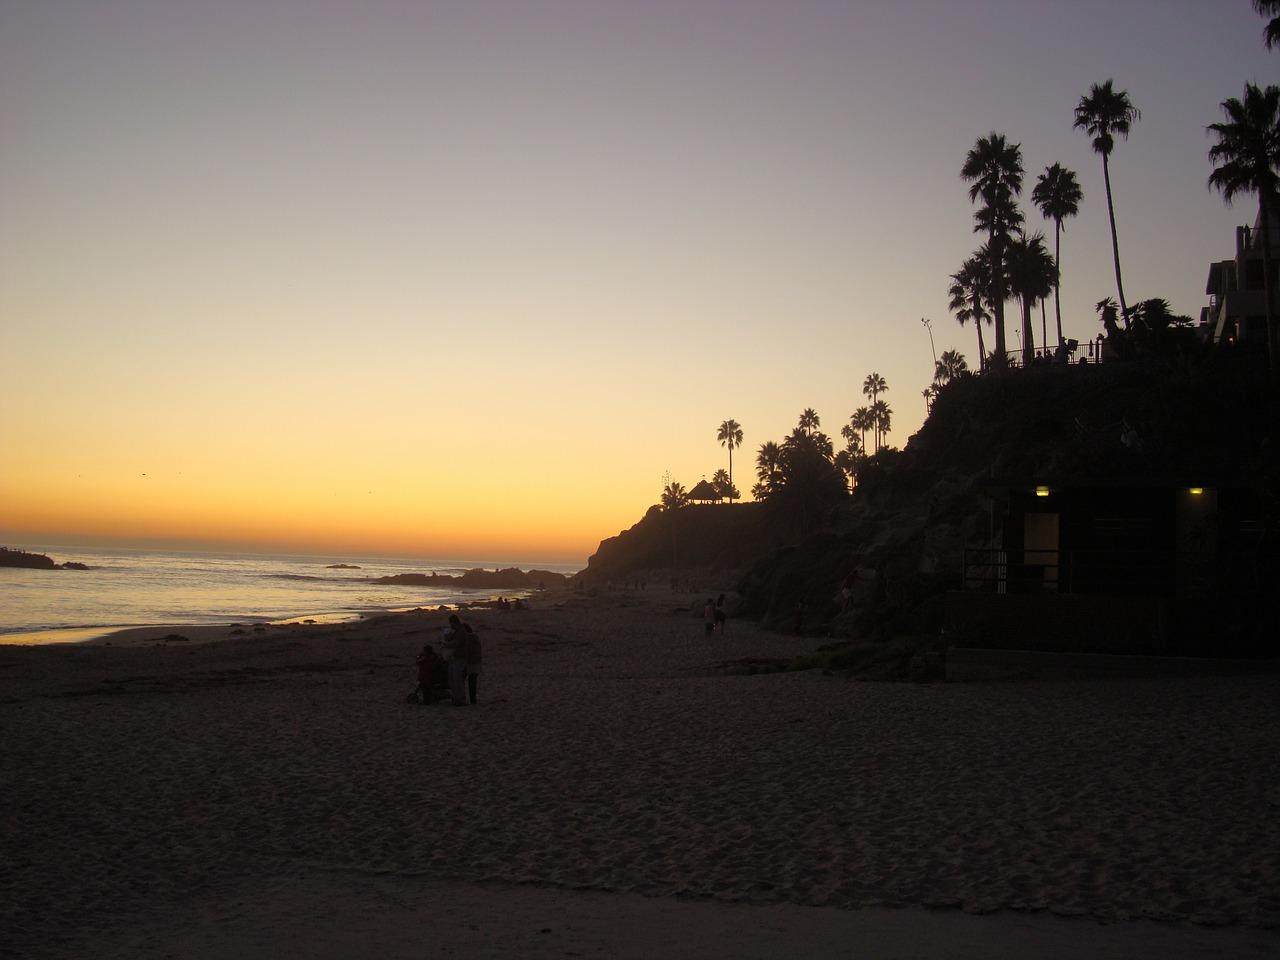 laguna beach sunset.jpg